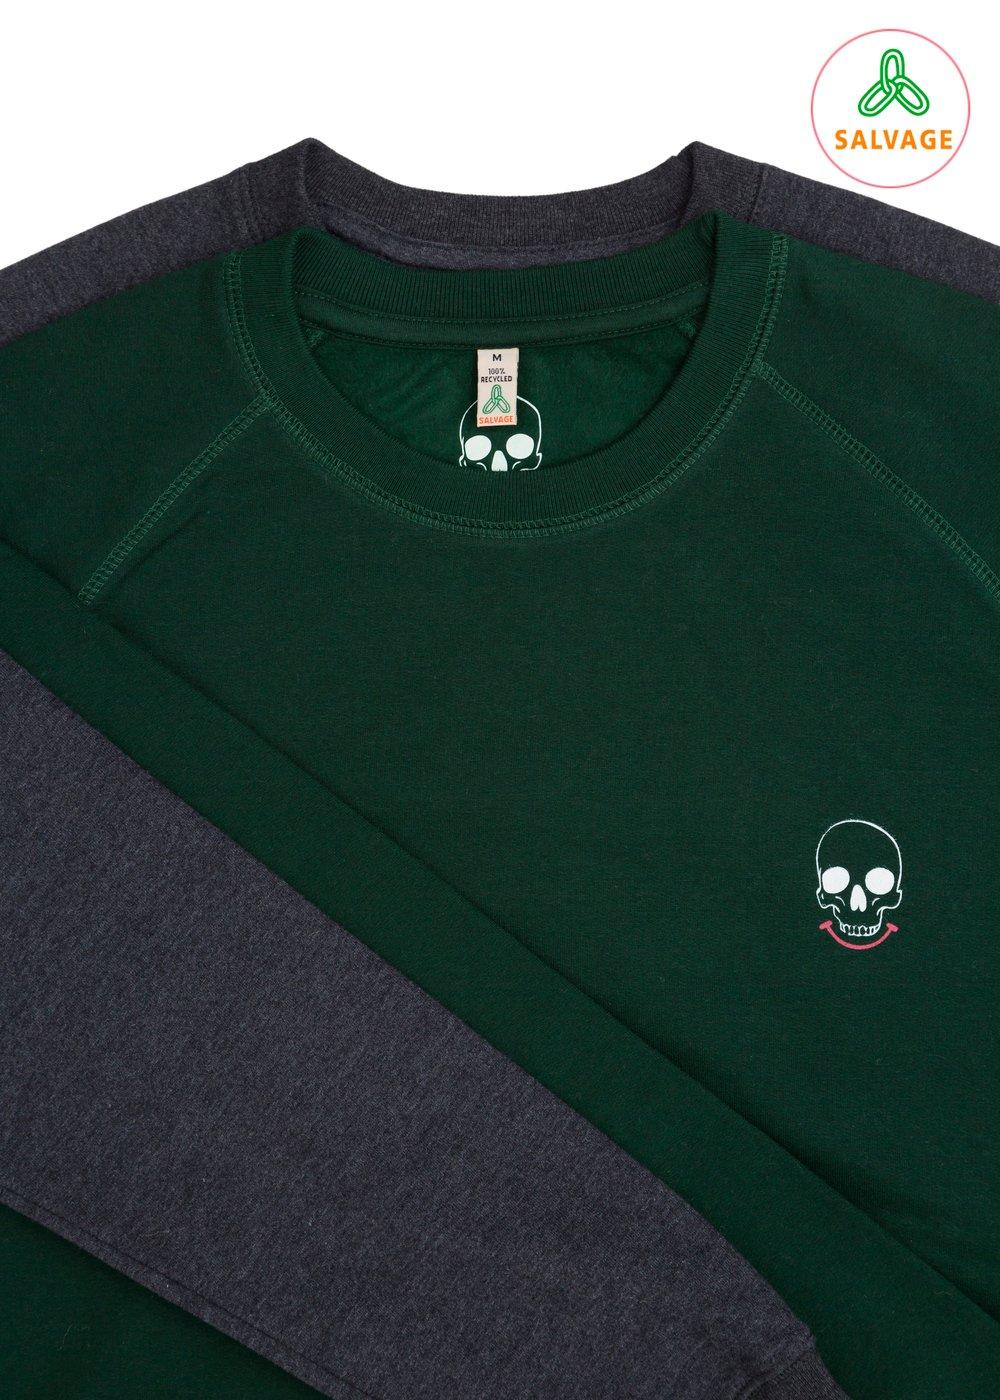 Unisex Smiley Skull pocket Sweatshirt (Recycled)